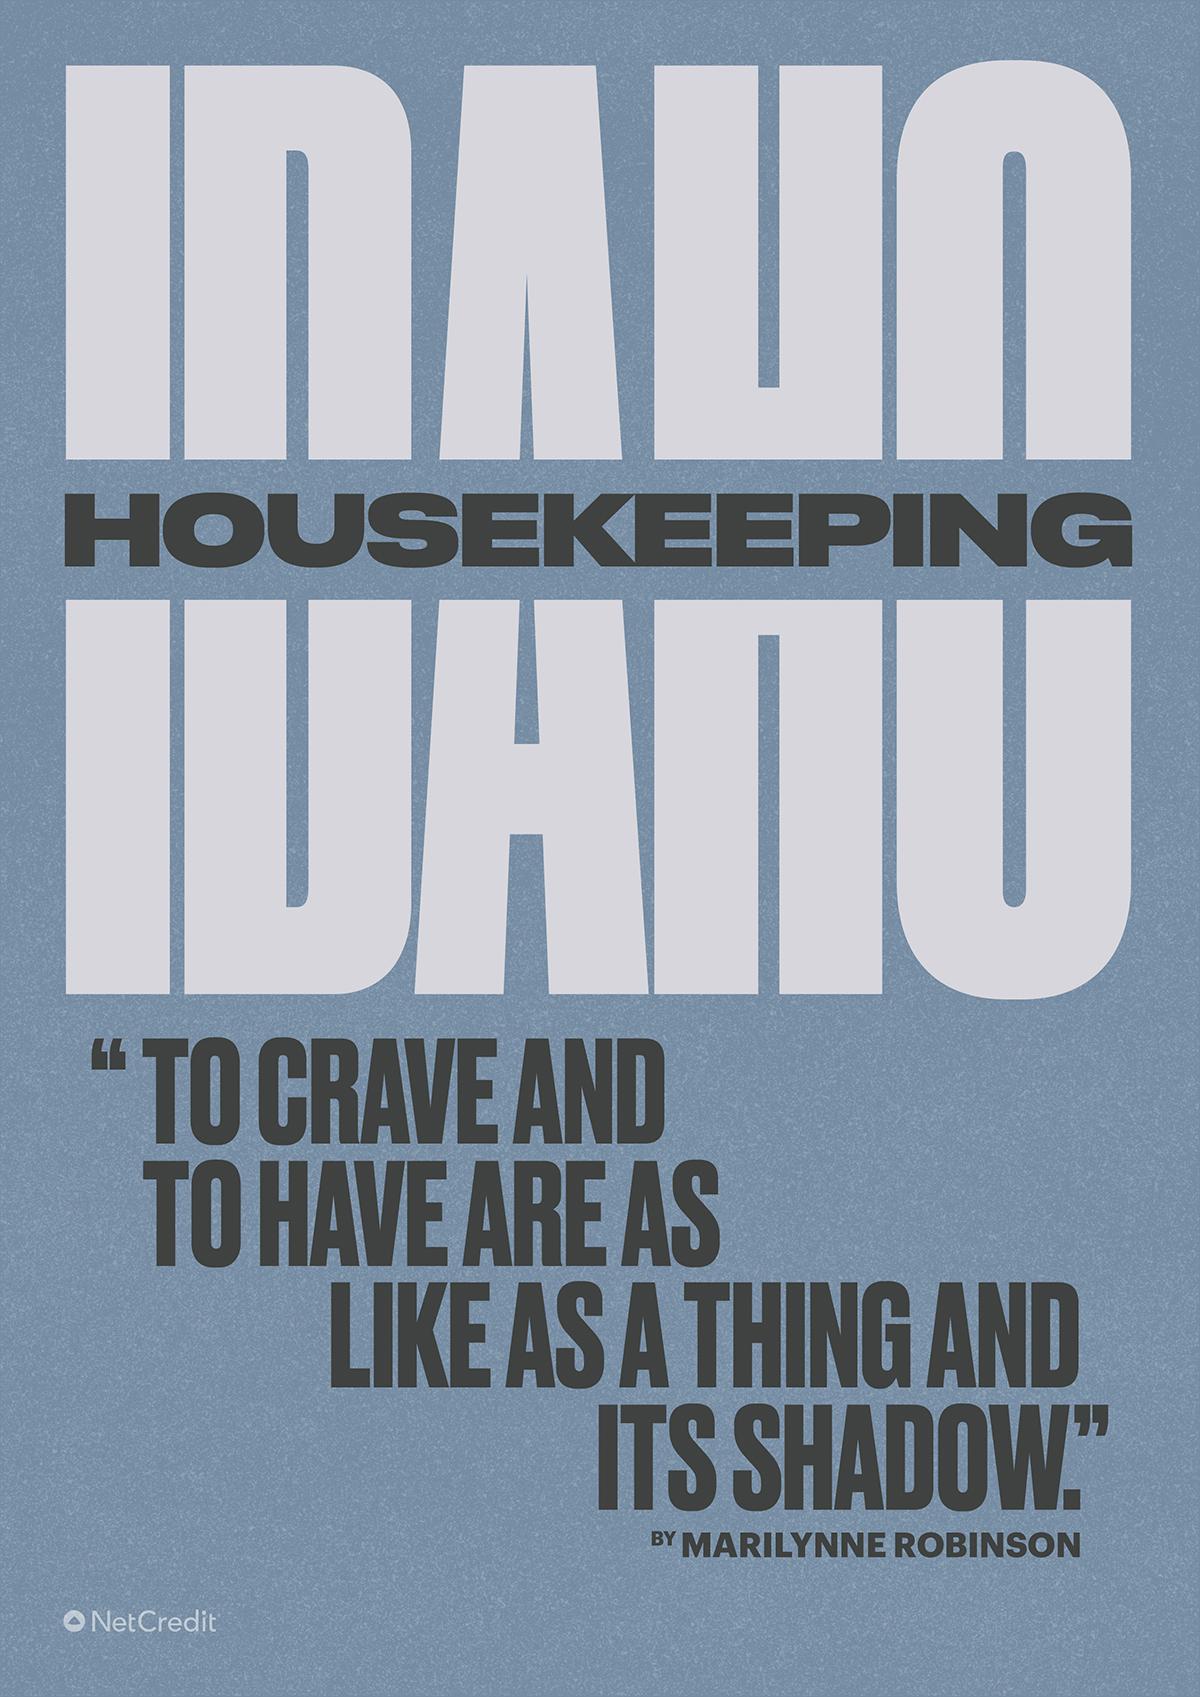 Housekeeping Idaho